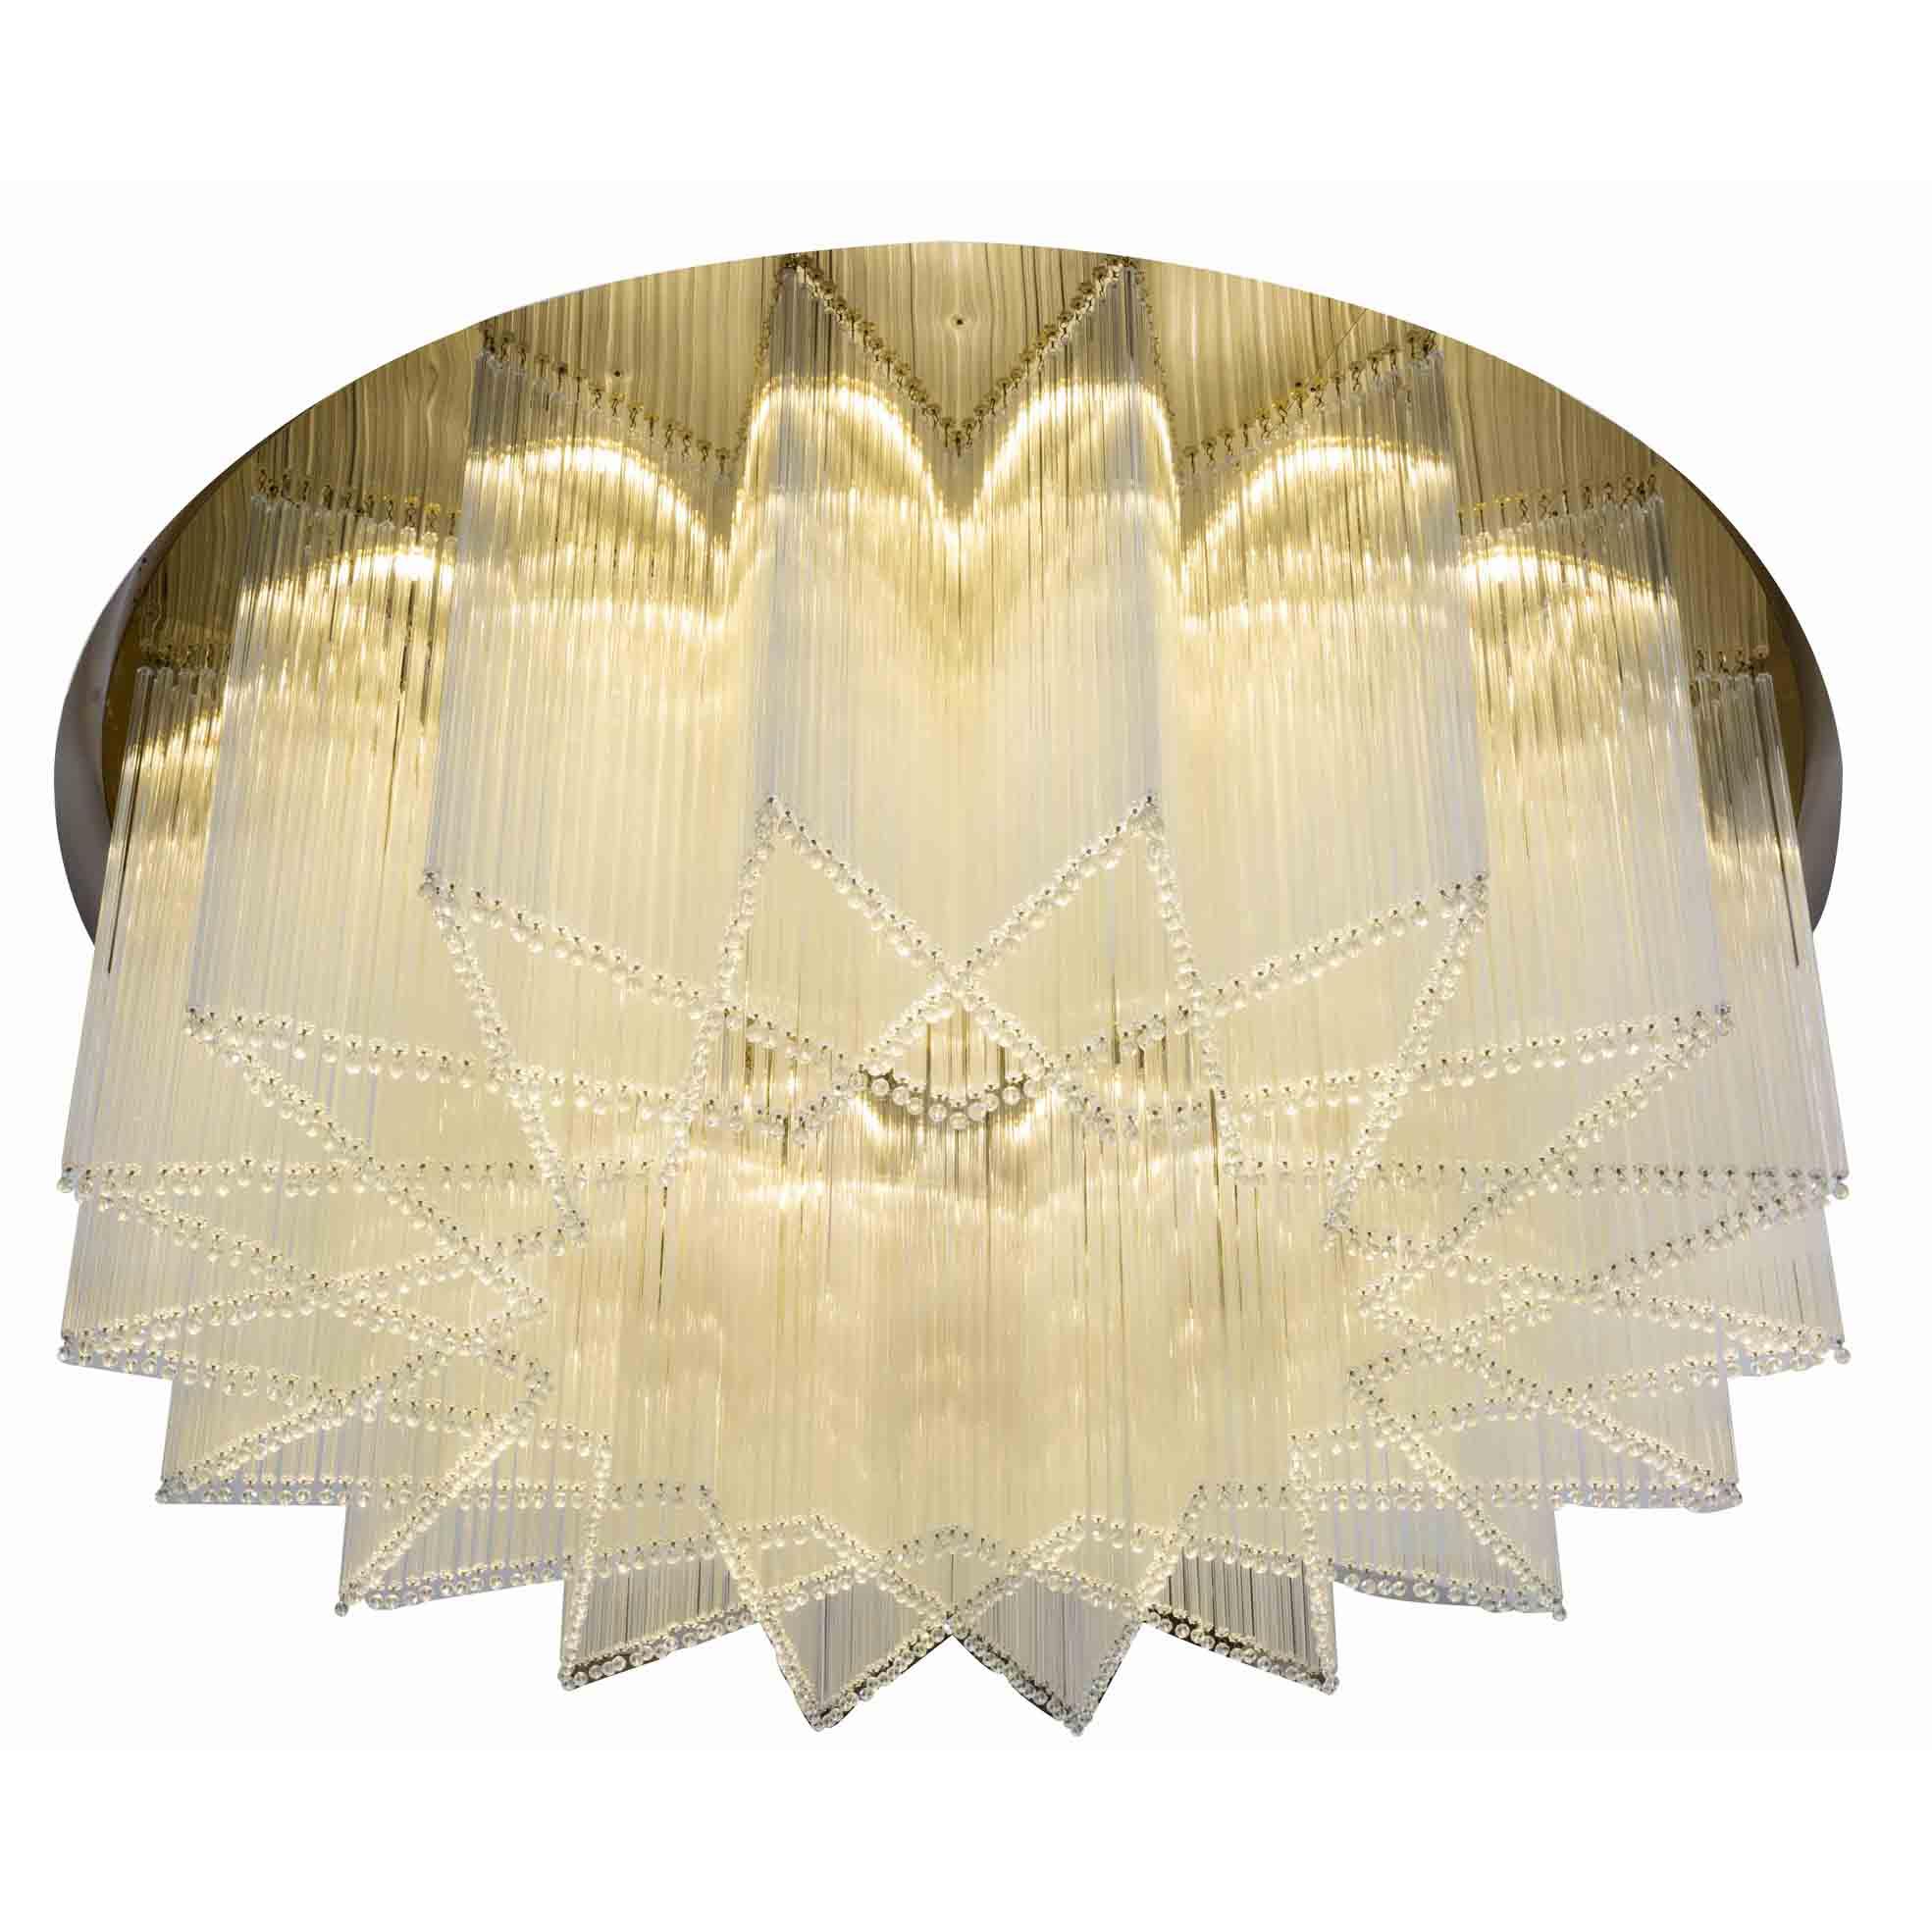 round restaurant chandeliers acrylic for lobby EME LIGHTING